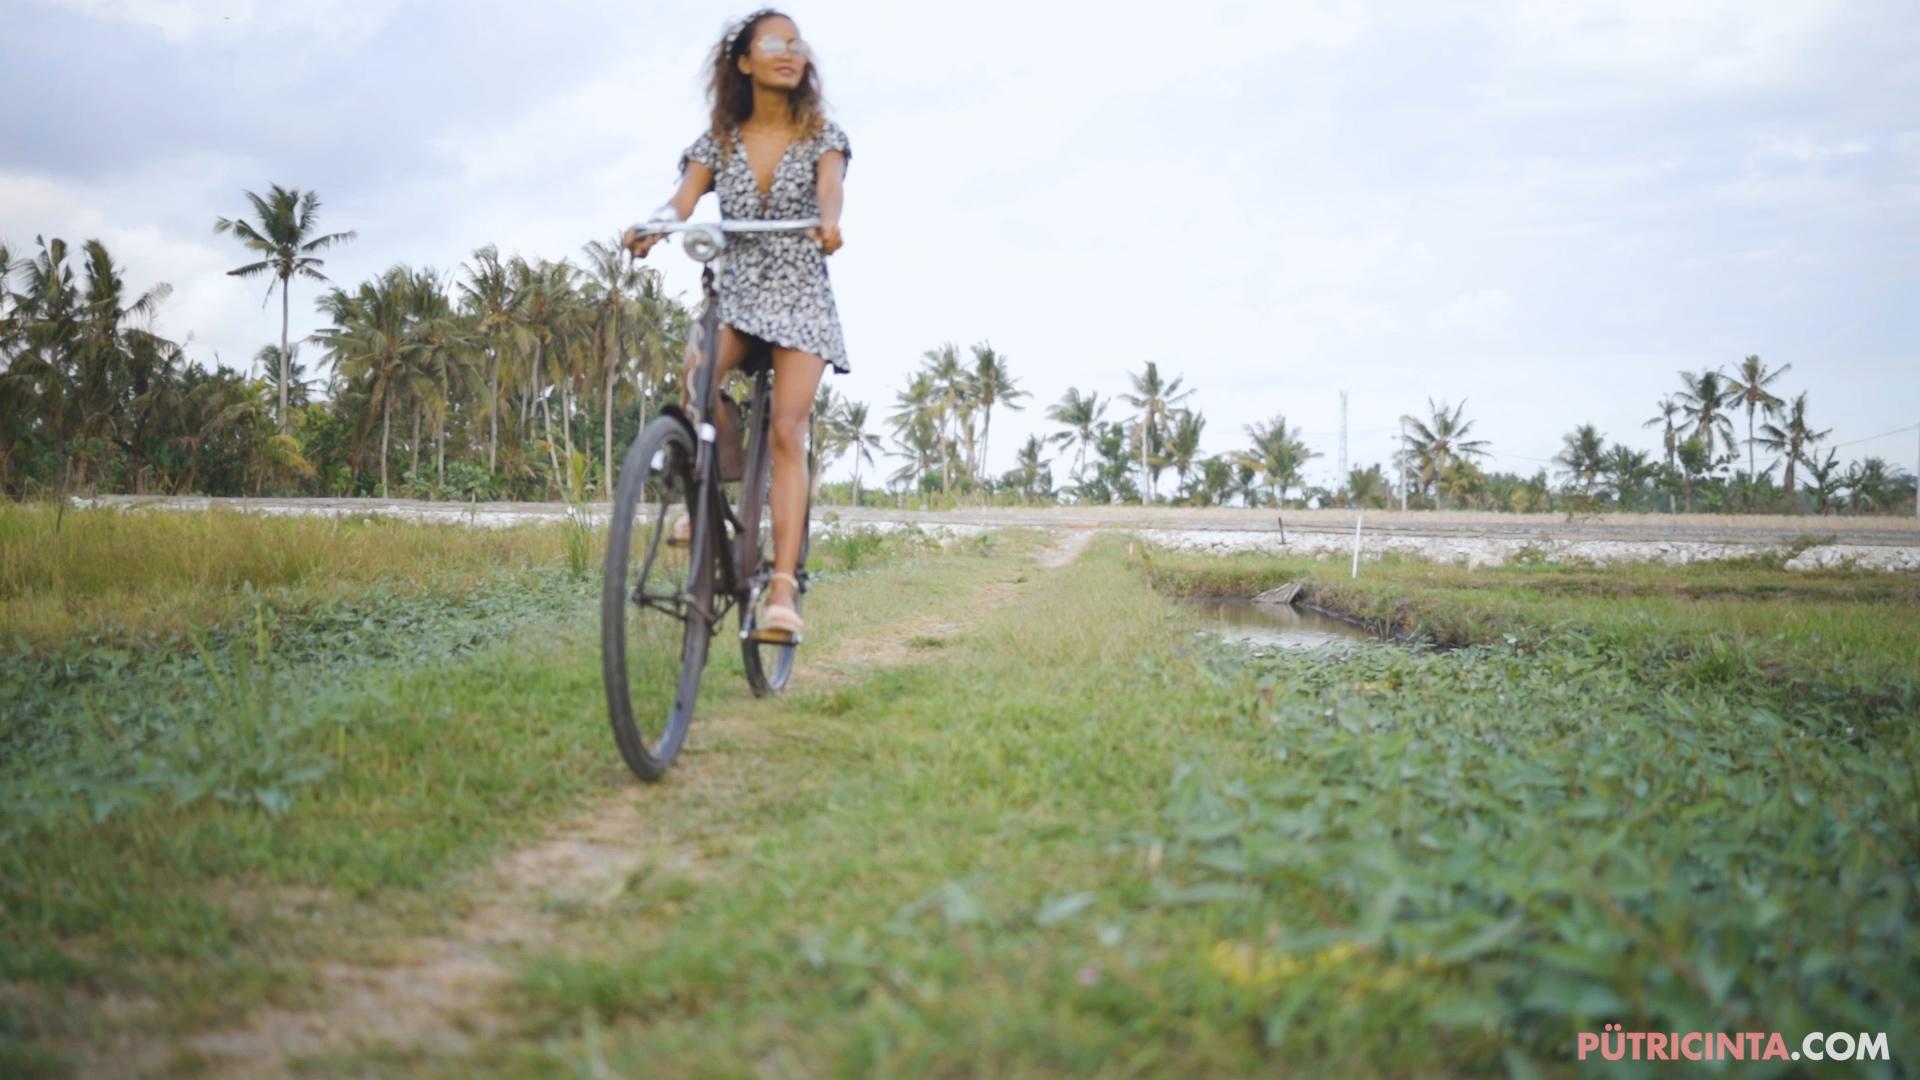 024-cyclingcommando-Putri-Cinta-teaser-stills-11.jpg